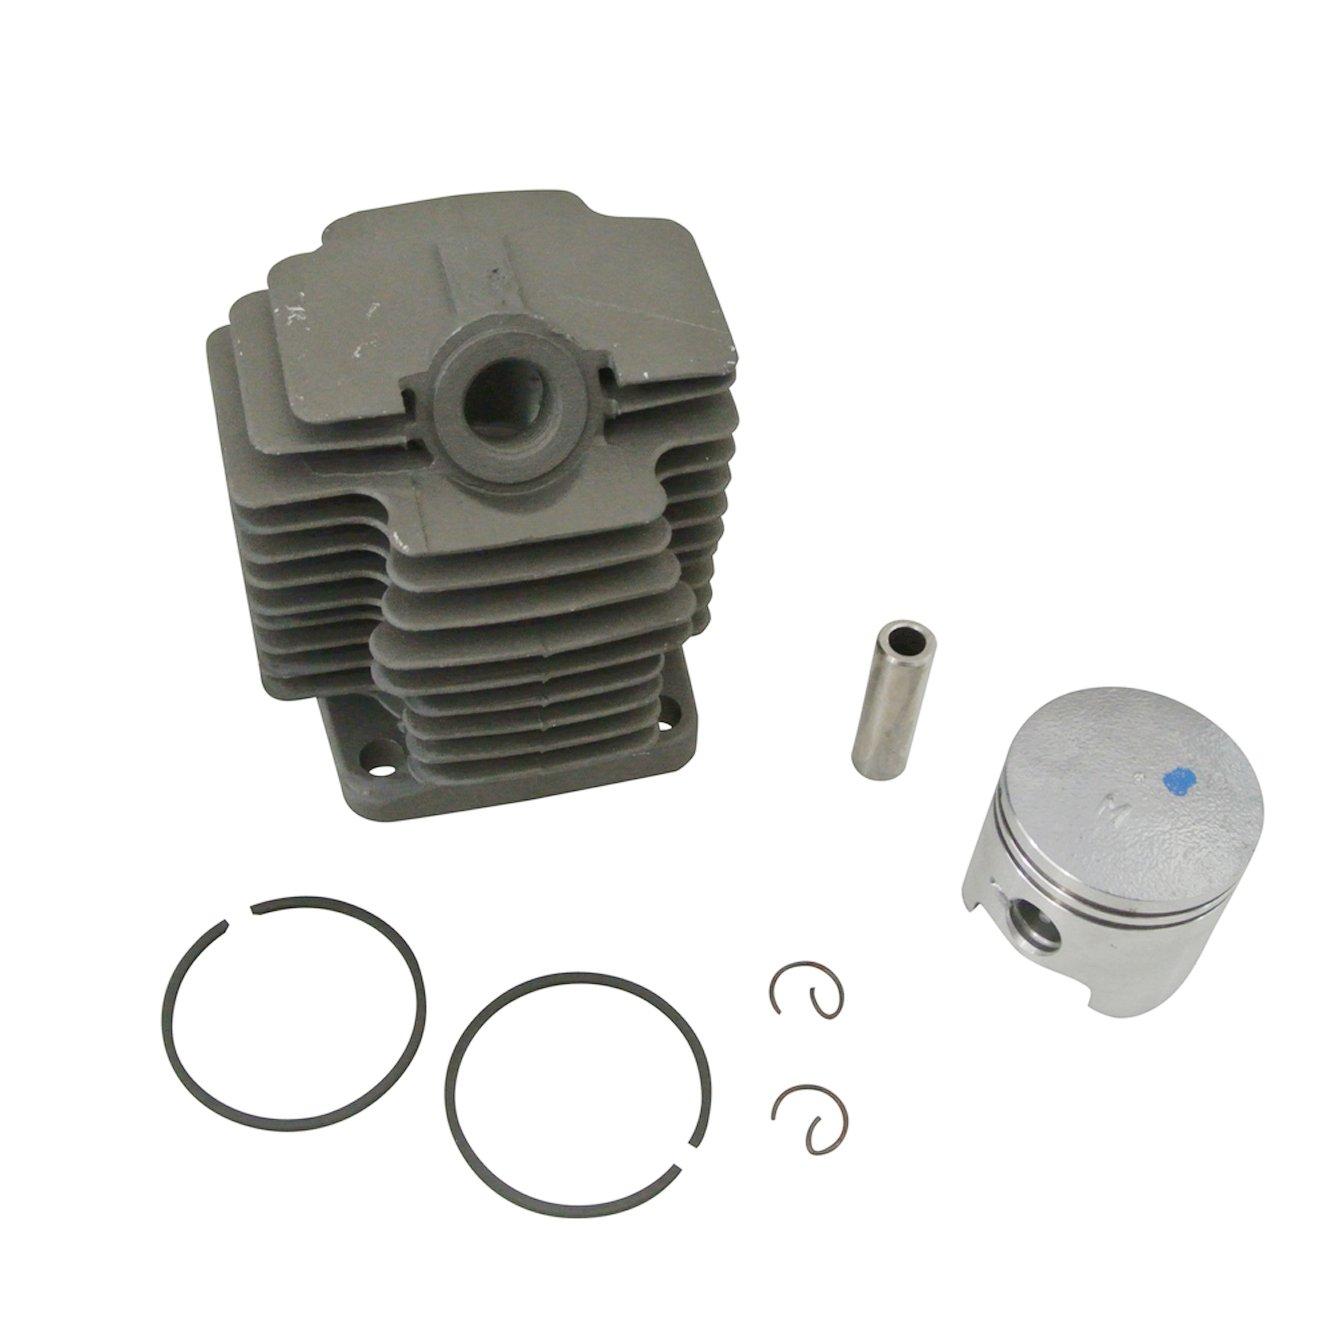 New 40mm Cylinder Head piston kit For Engine Parts 47cc 49cc 2-stroke JL JIANGLI LEGEND